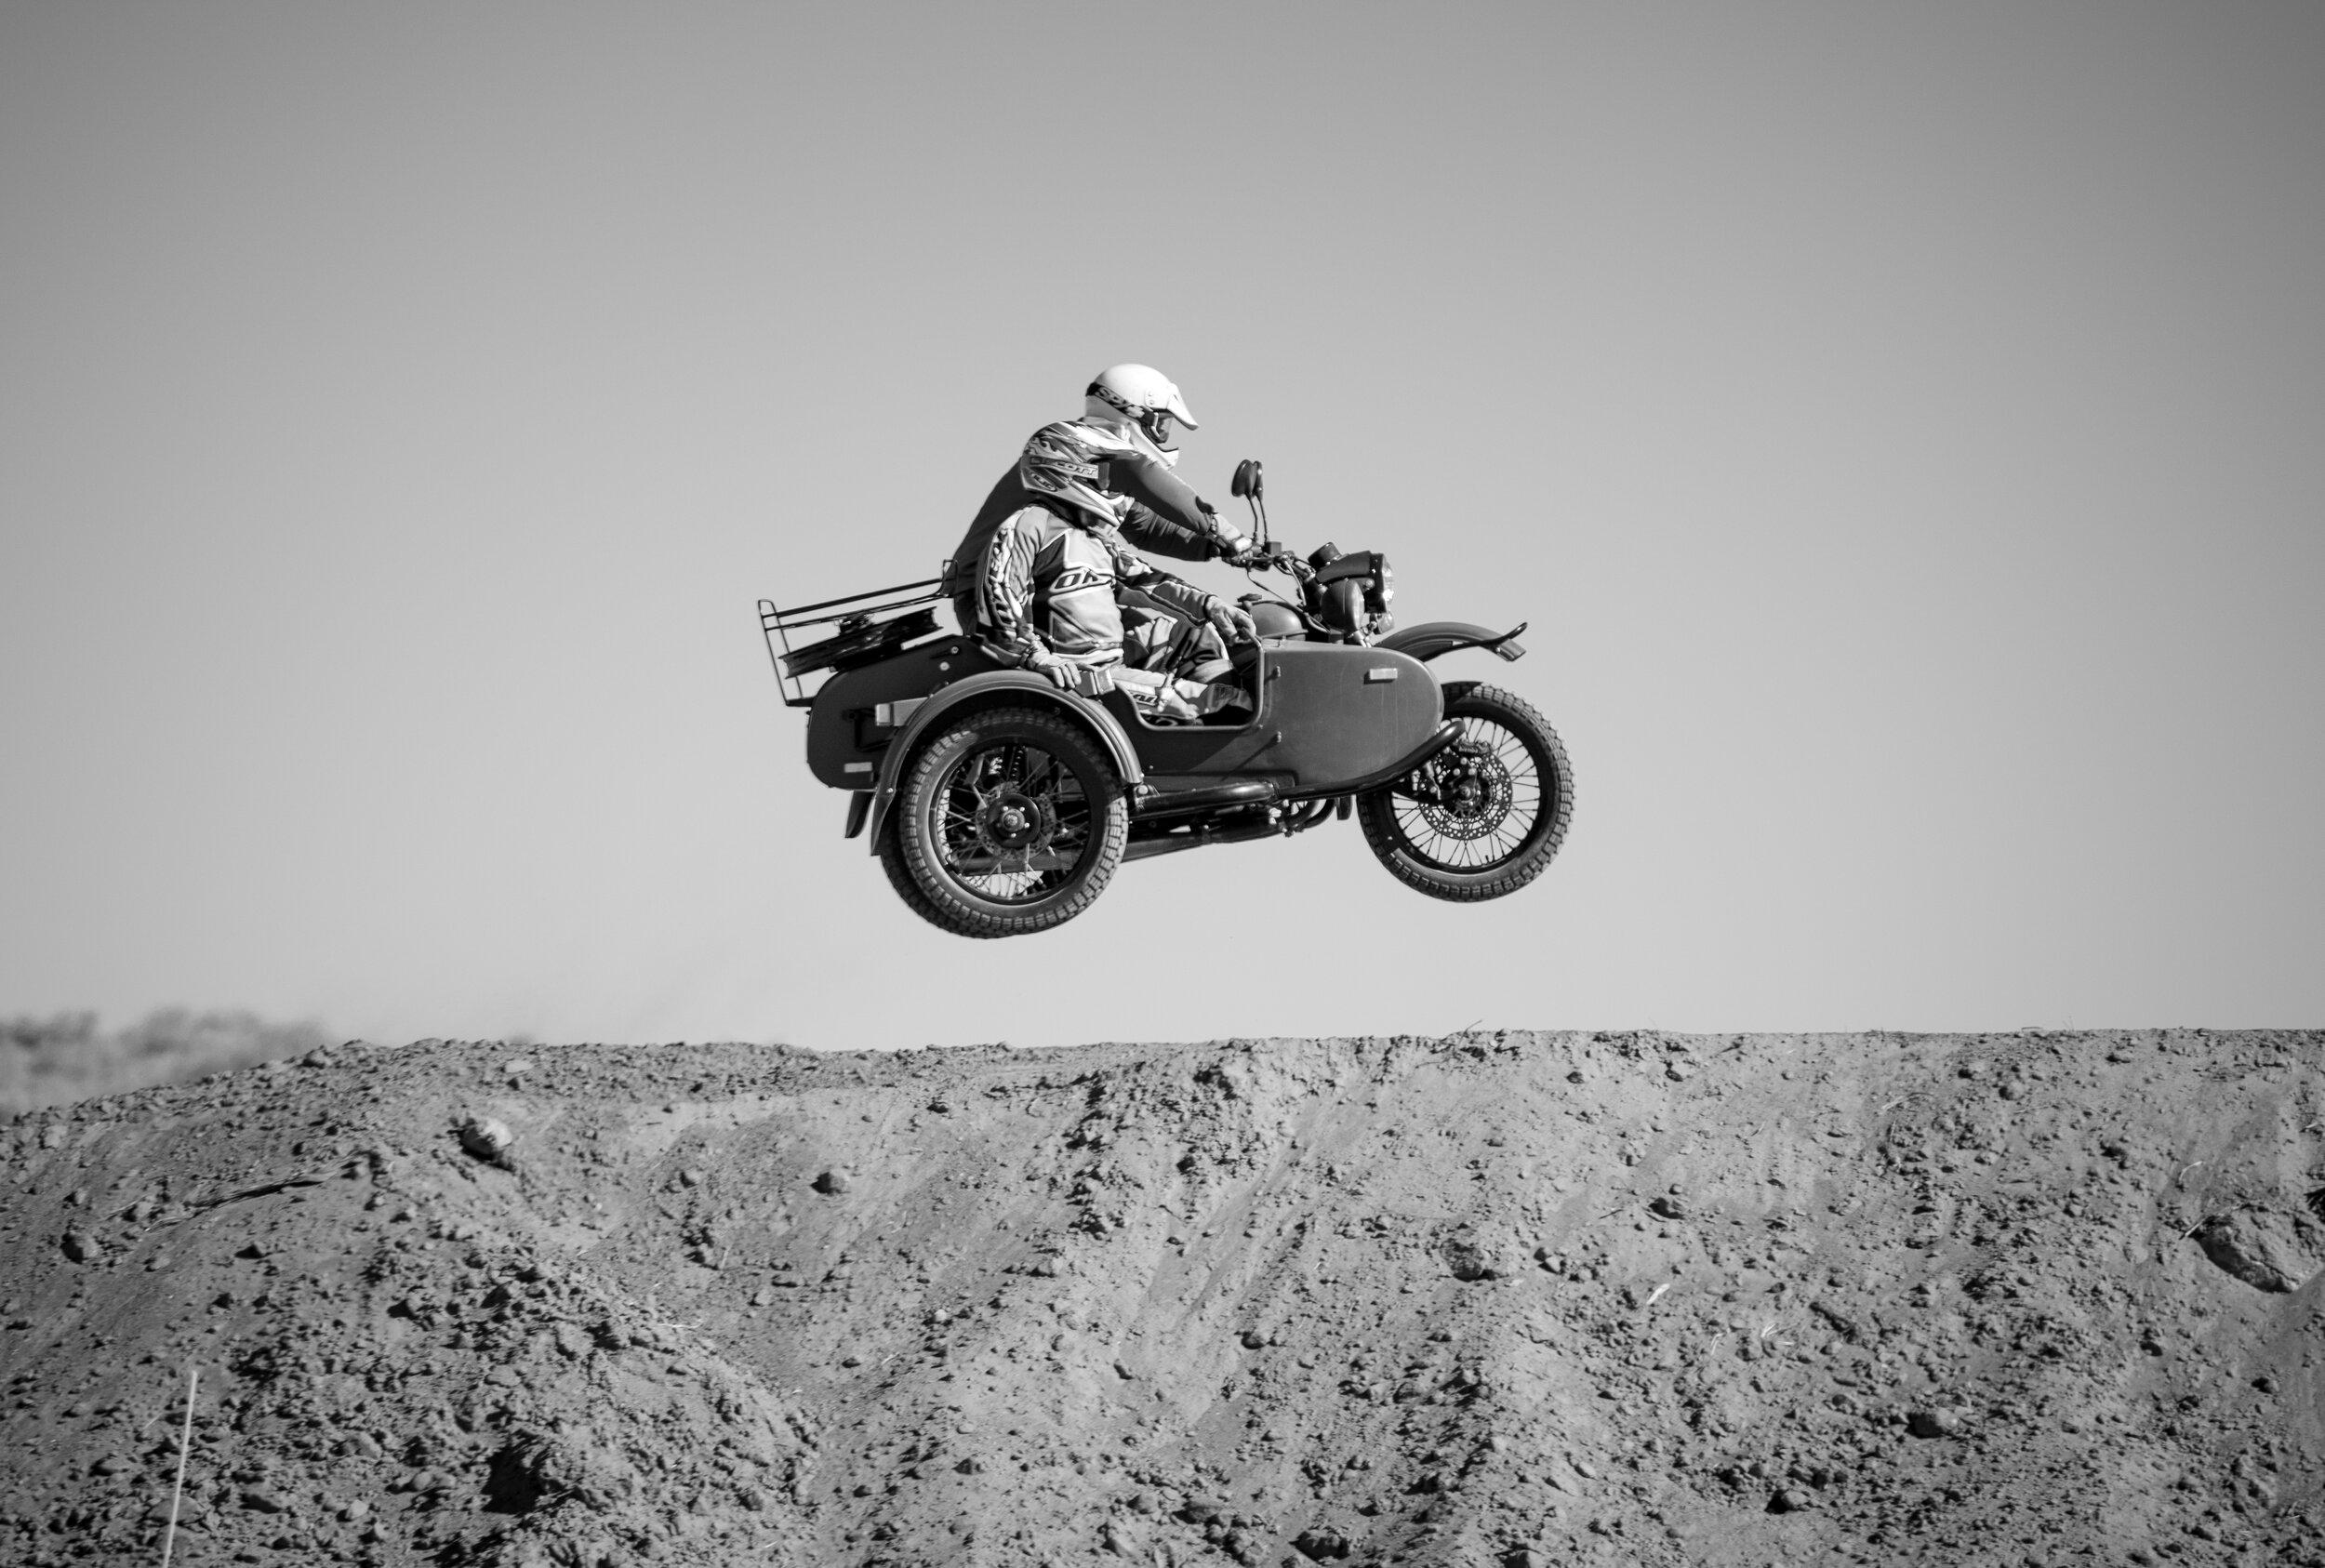 erikgraham_silodrome_the_desert_race_oregon 23.jpg